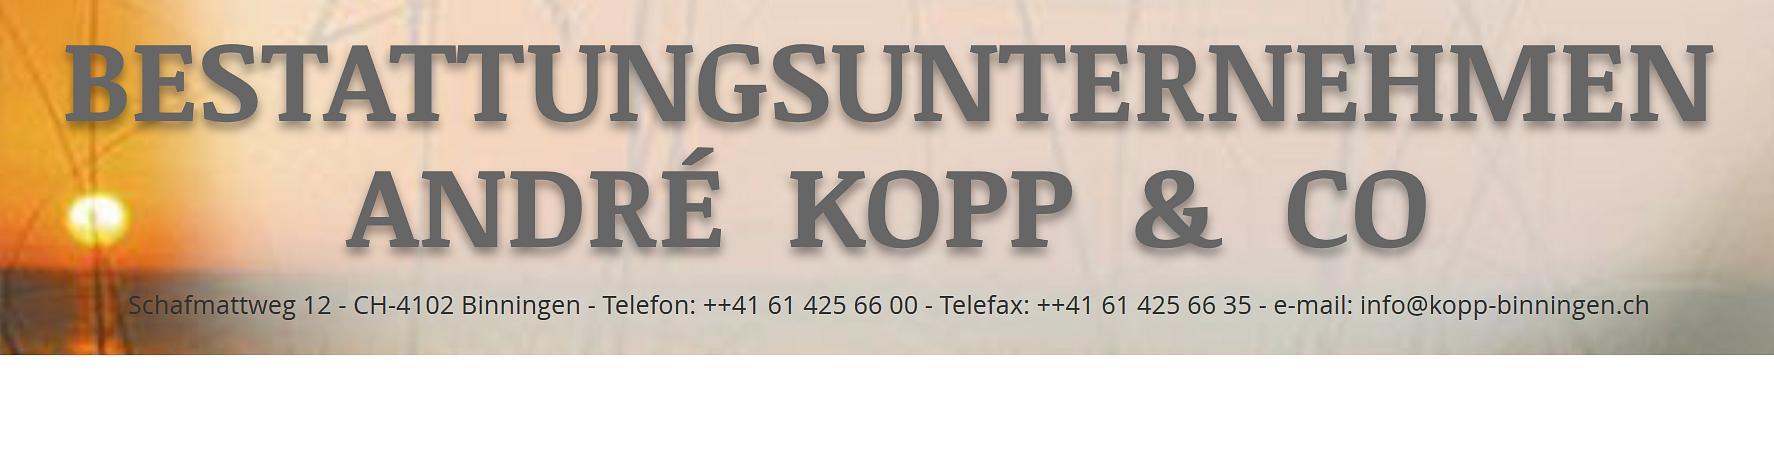 André Kopp & Co